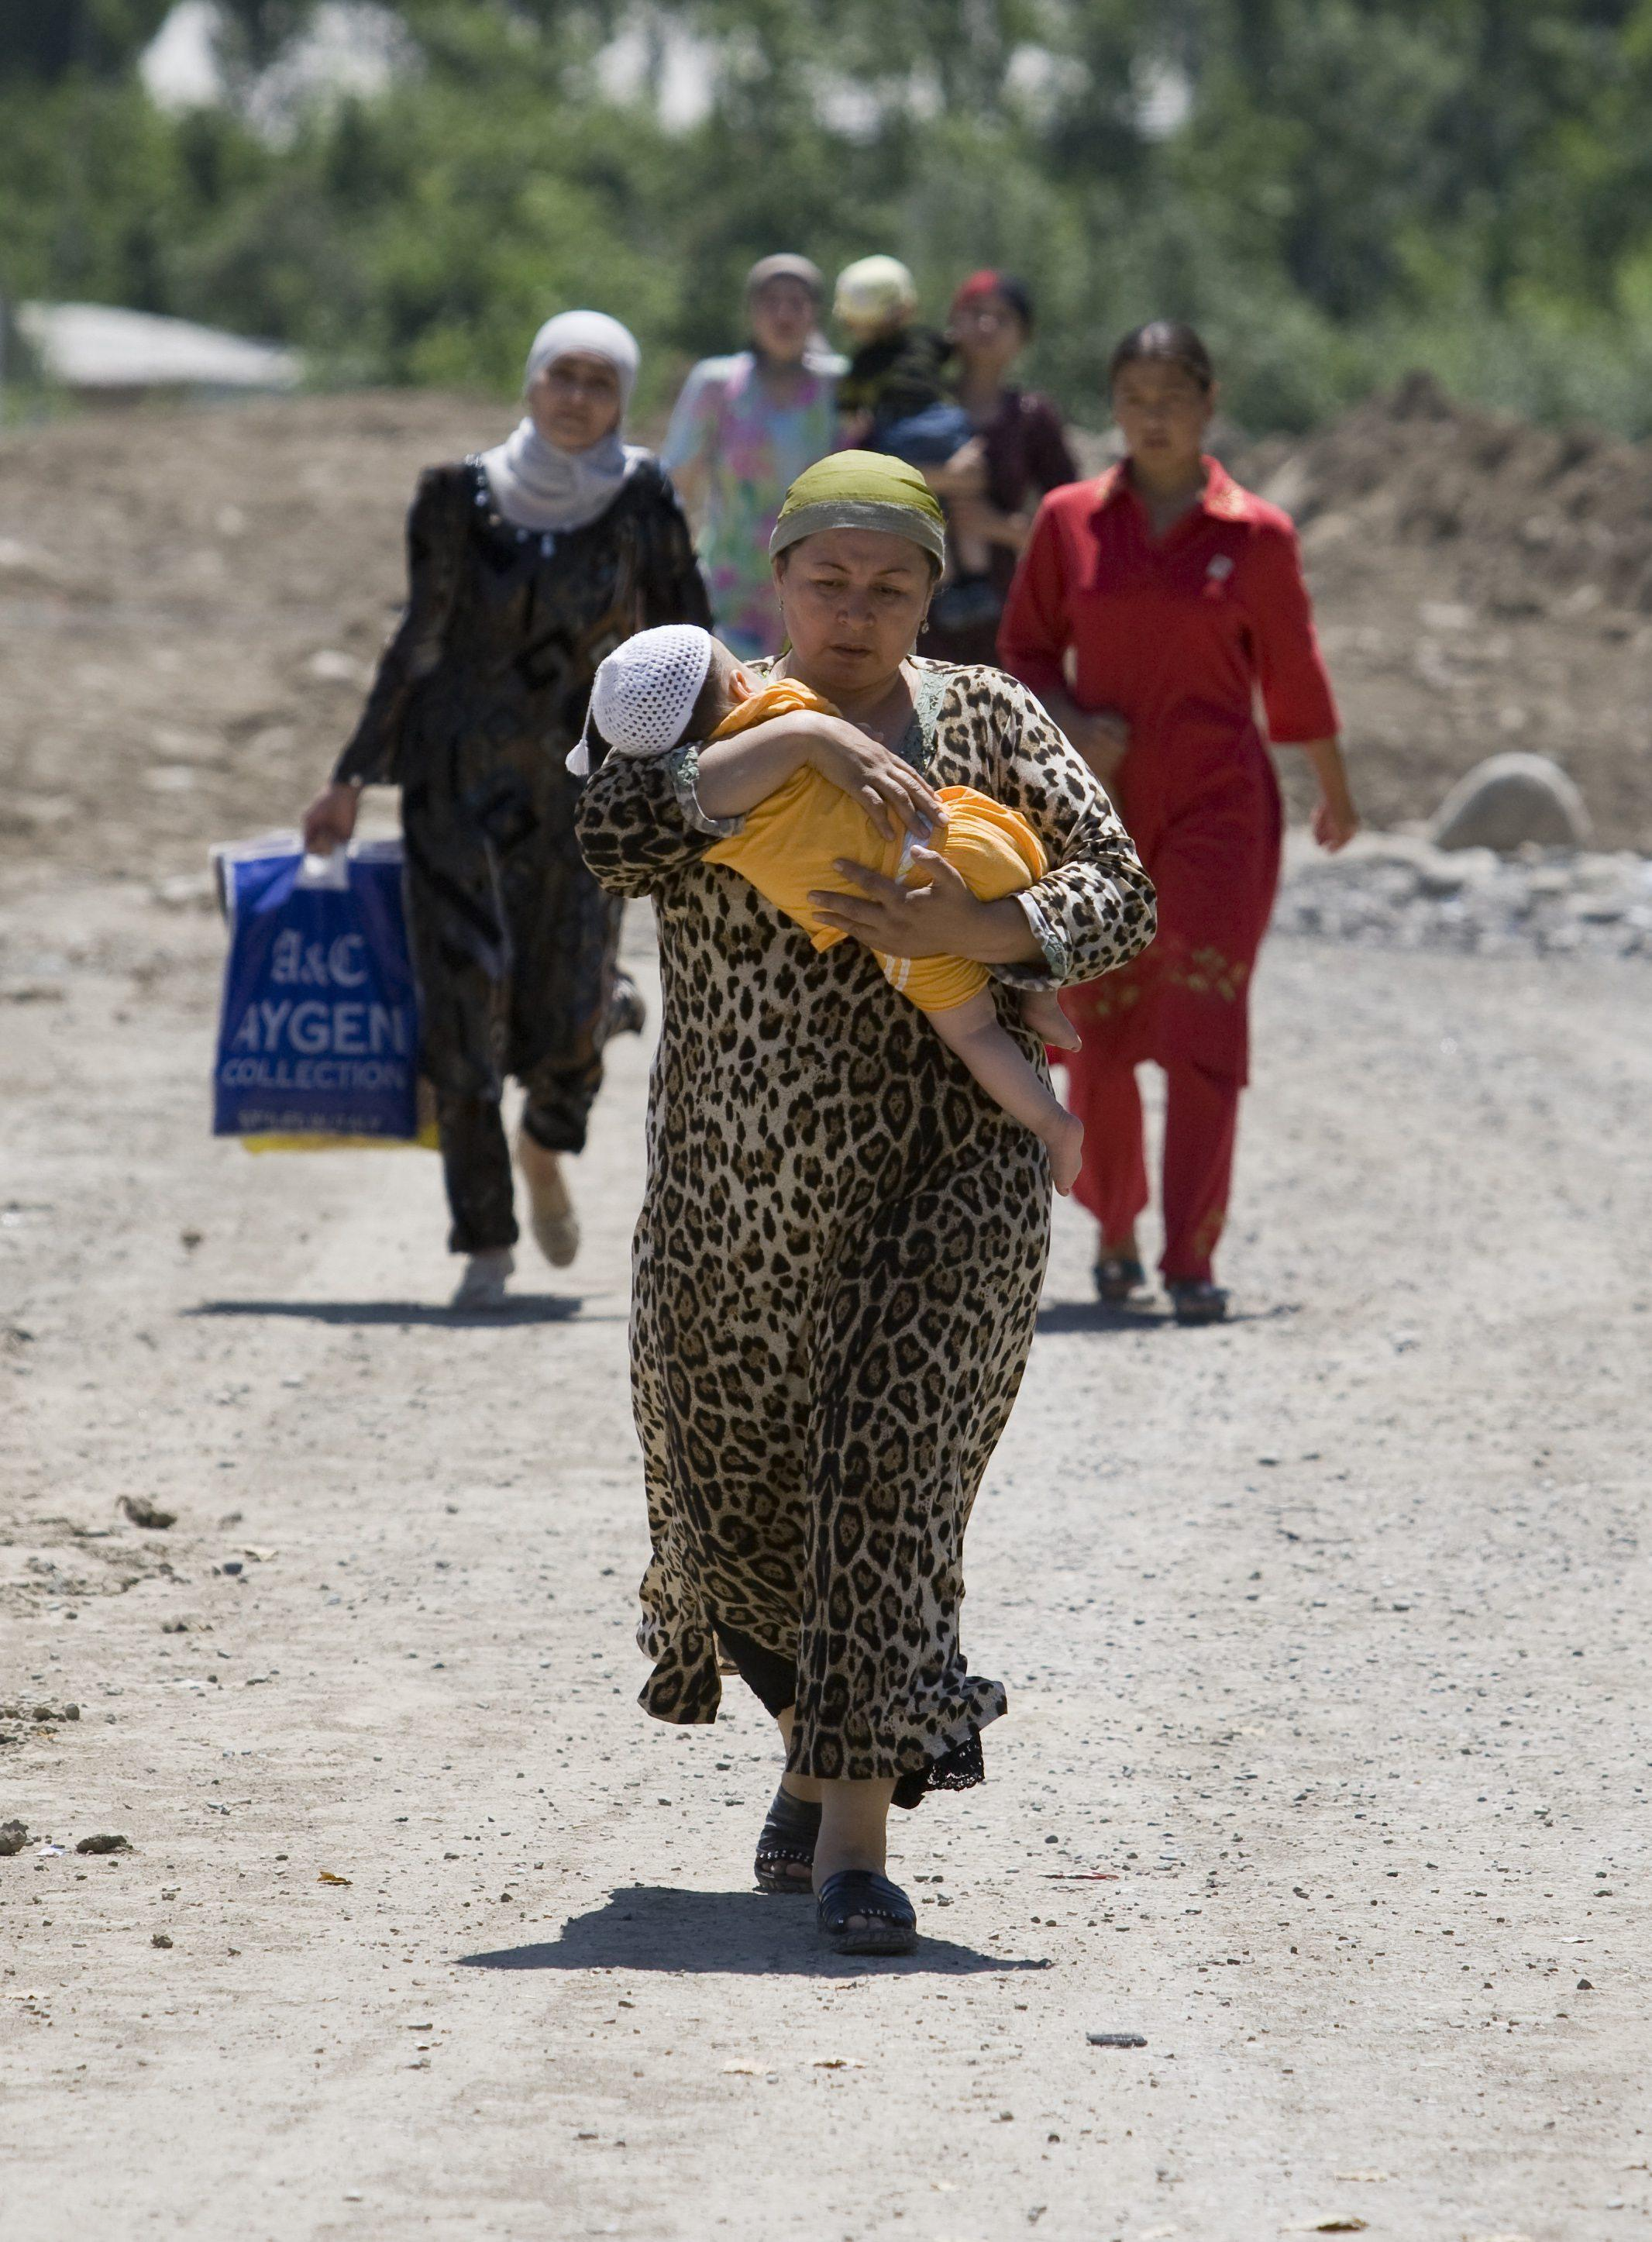 Ethnic Uzbek women who fled from southern Kyrgyzstan in the village of Yorkishlak